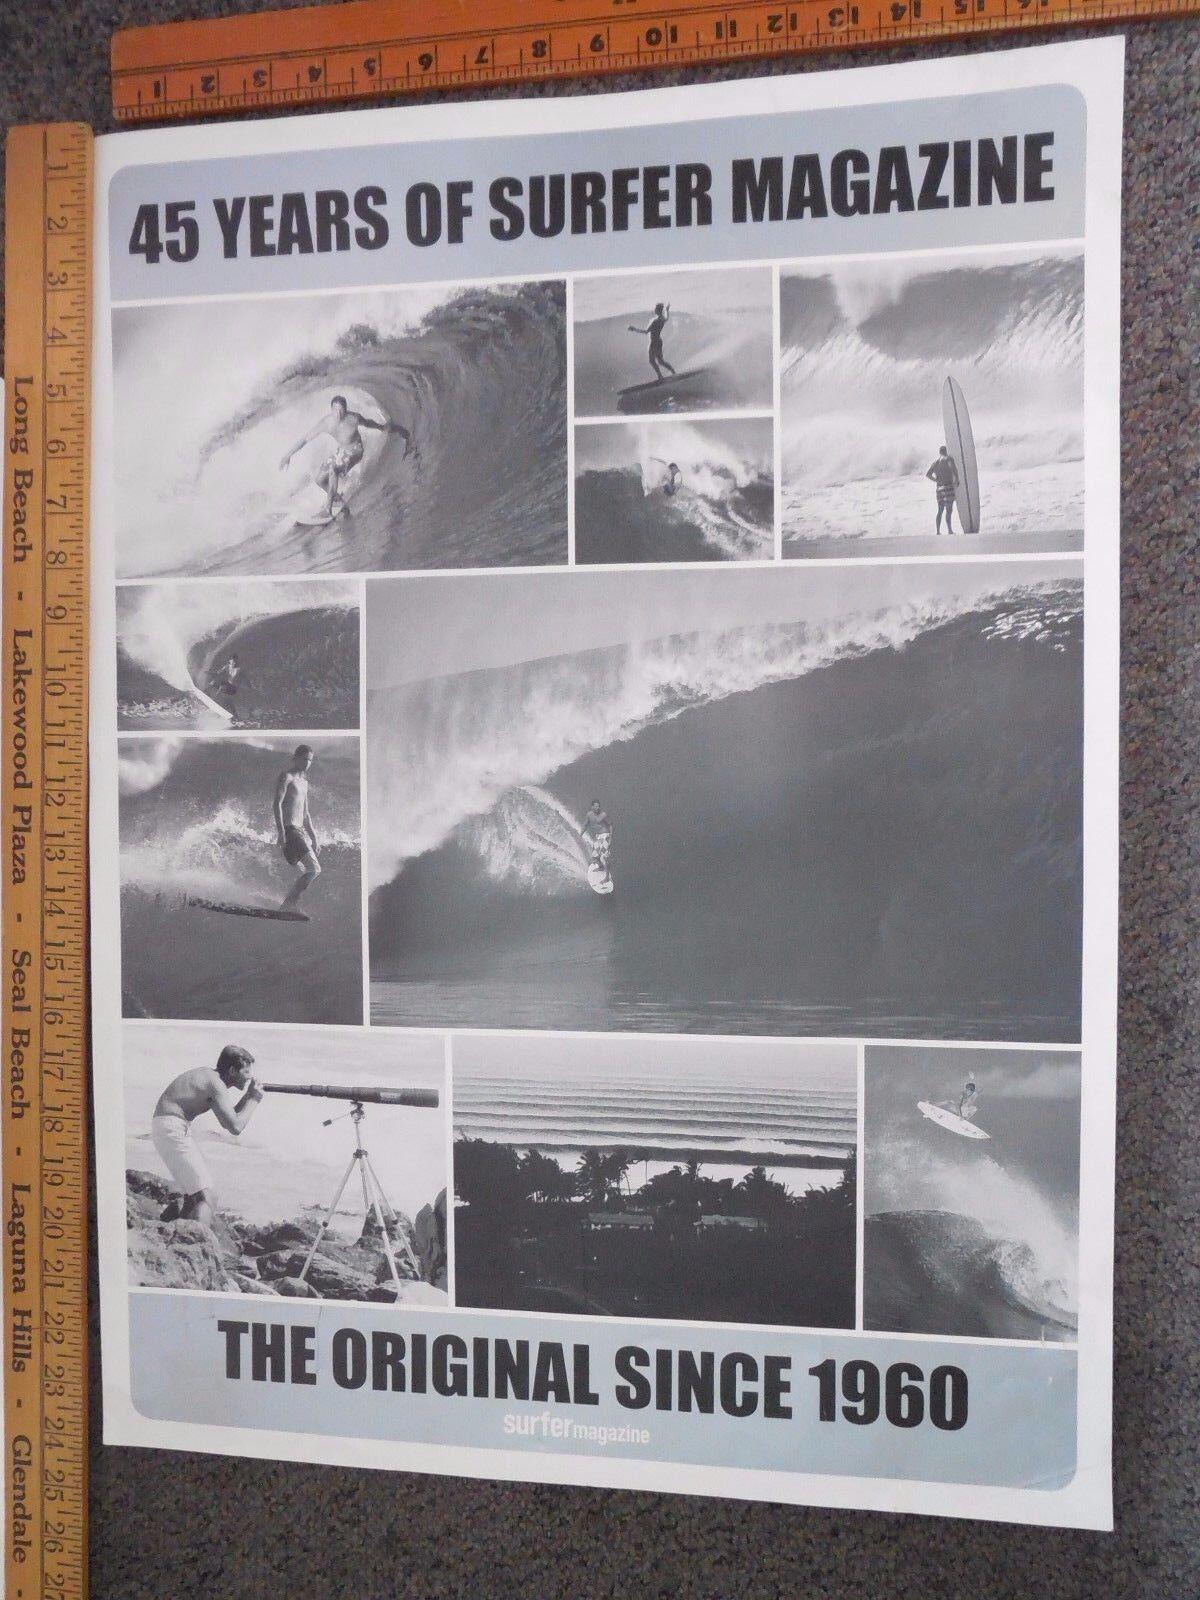 Vtg 45 Years of SURFER MAGAZINE Poster   Severson Photos   Greg Noll   Hawaii